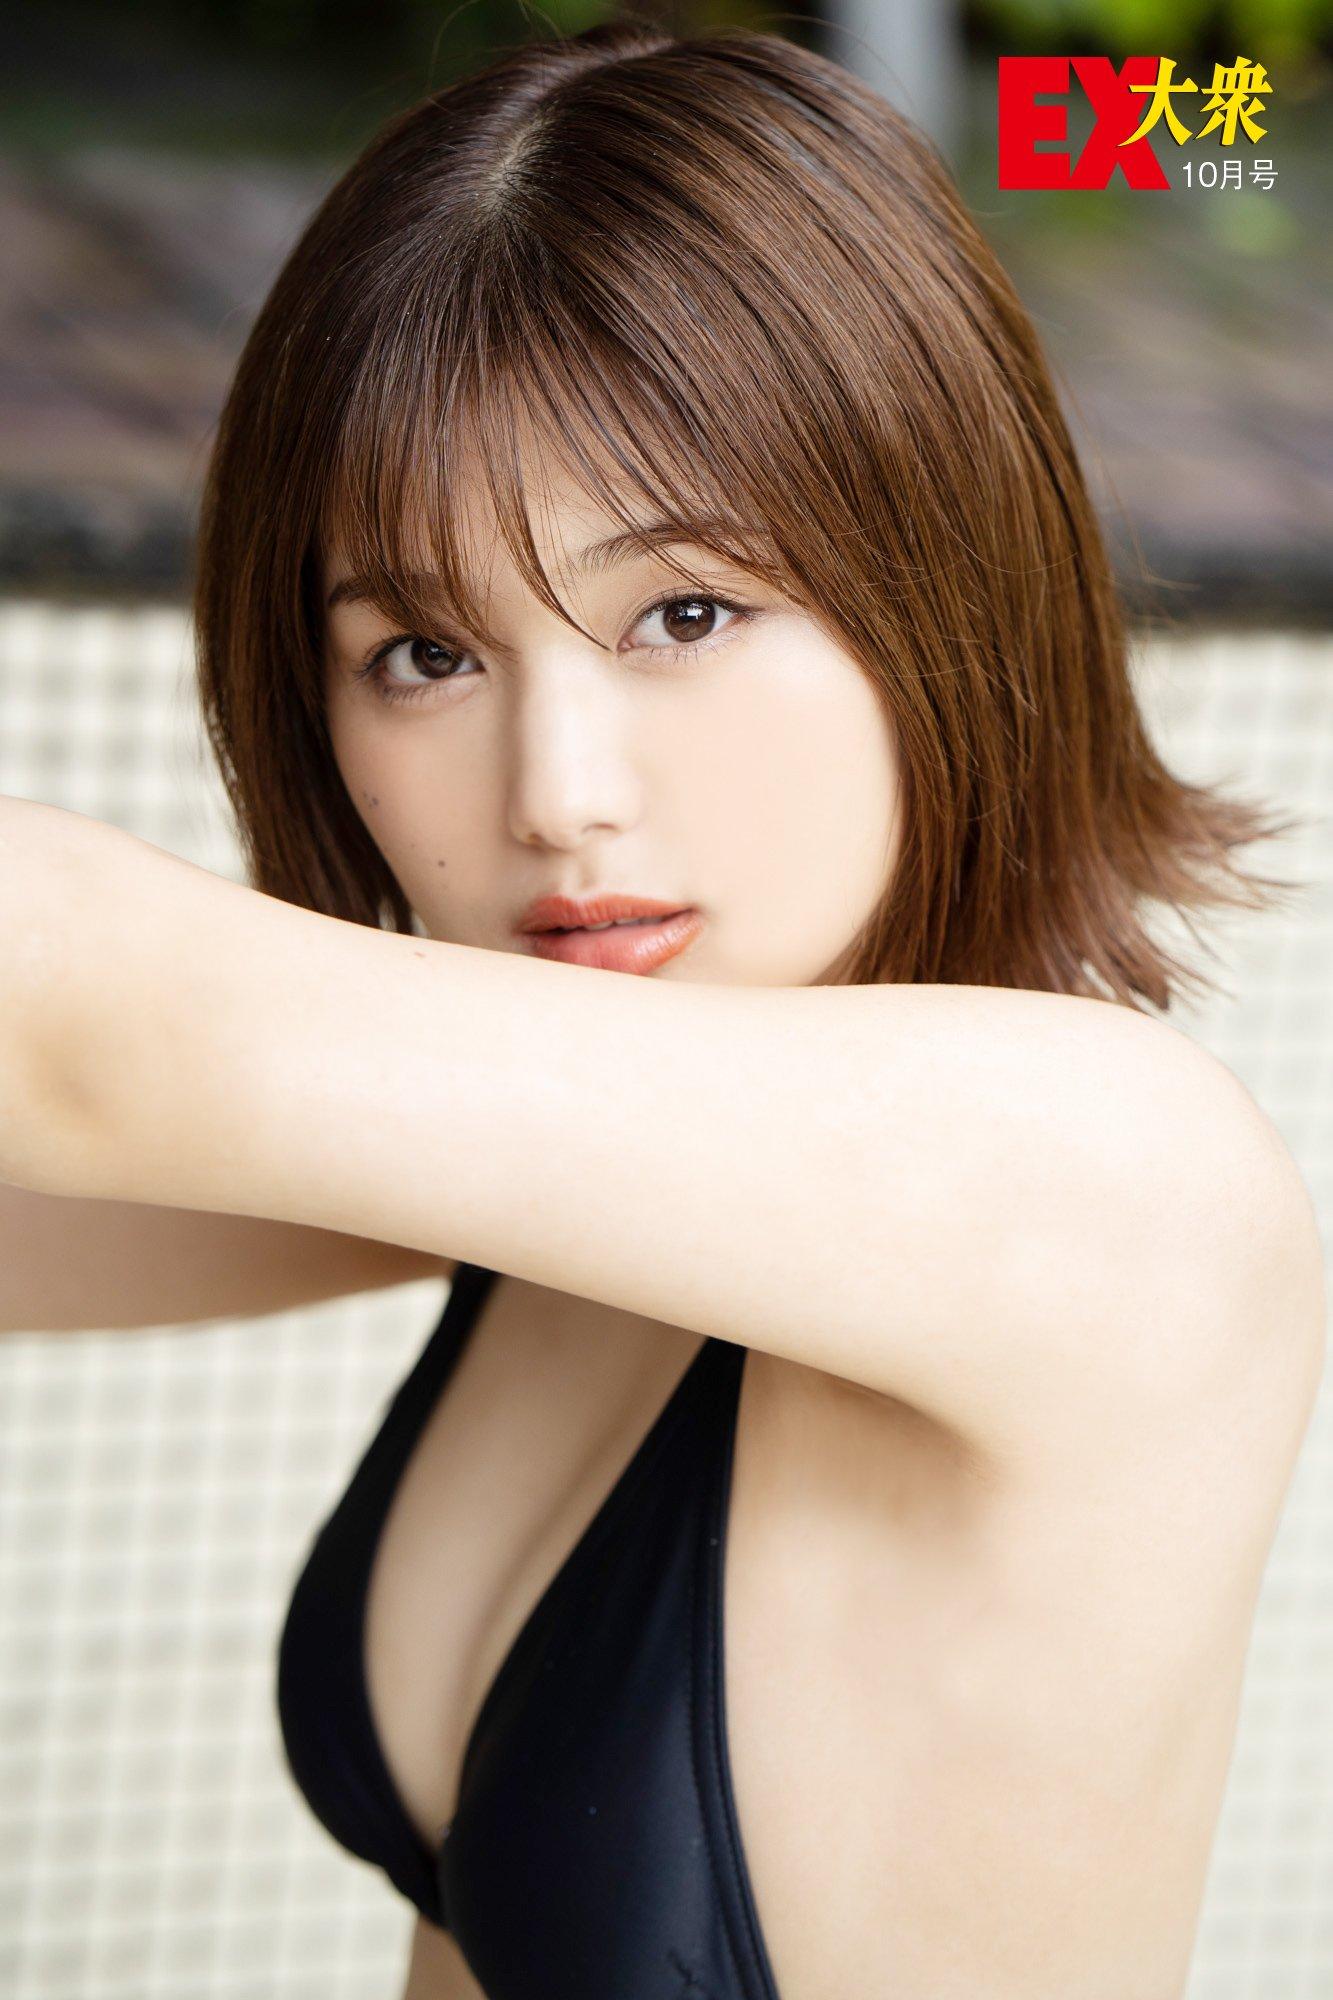 SKE48北野瑠華の本誌未掲載カット6枚を大公開!【EX大衆10月号】の画像002